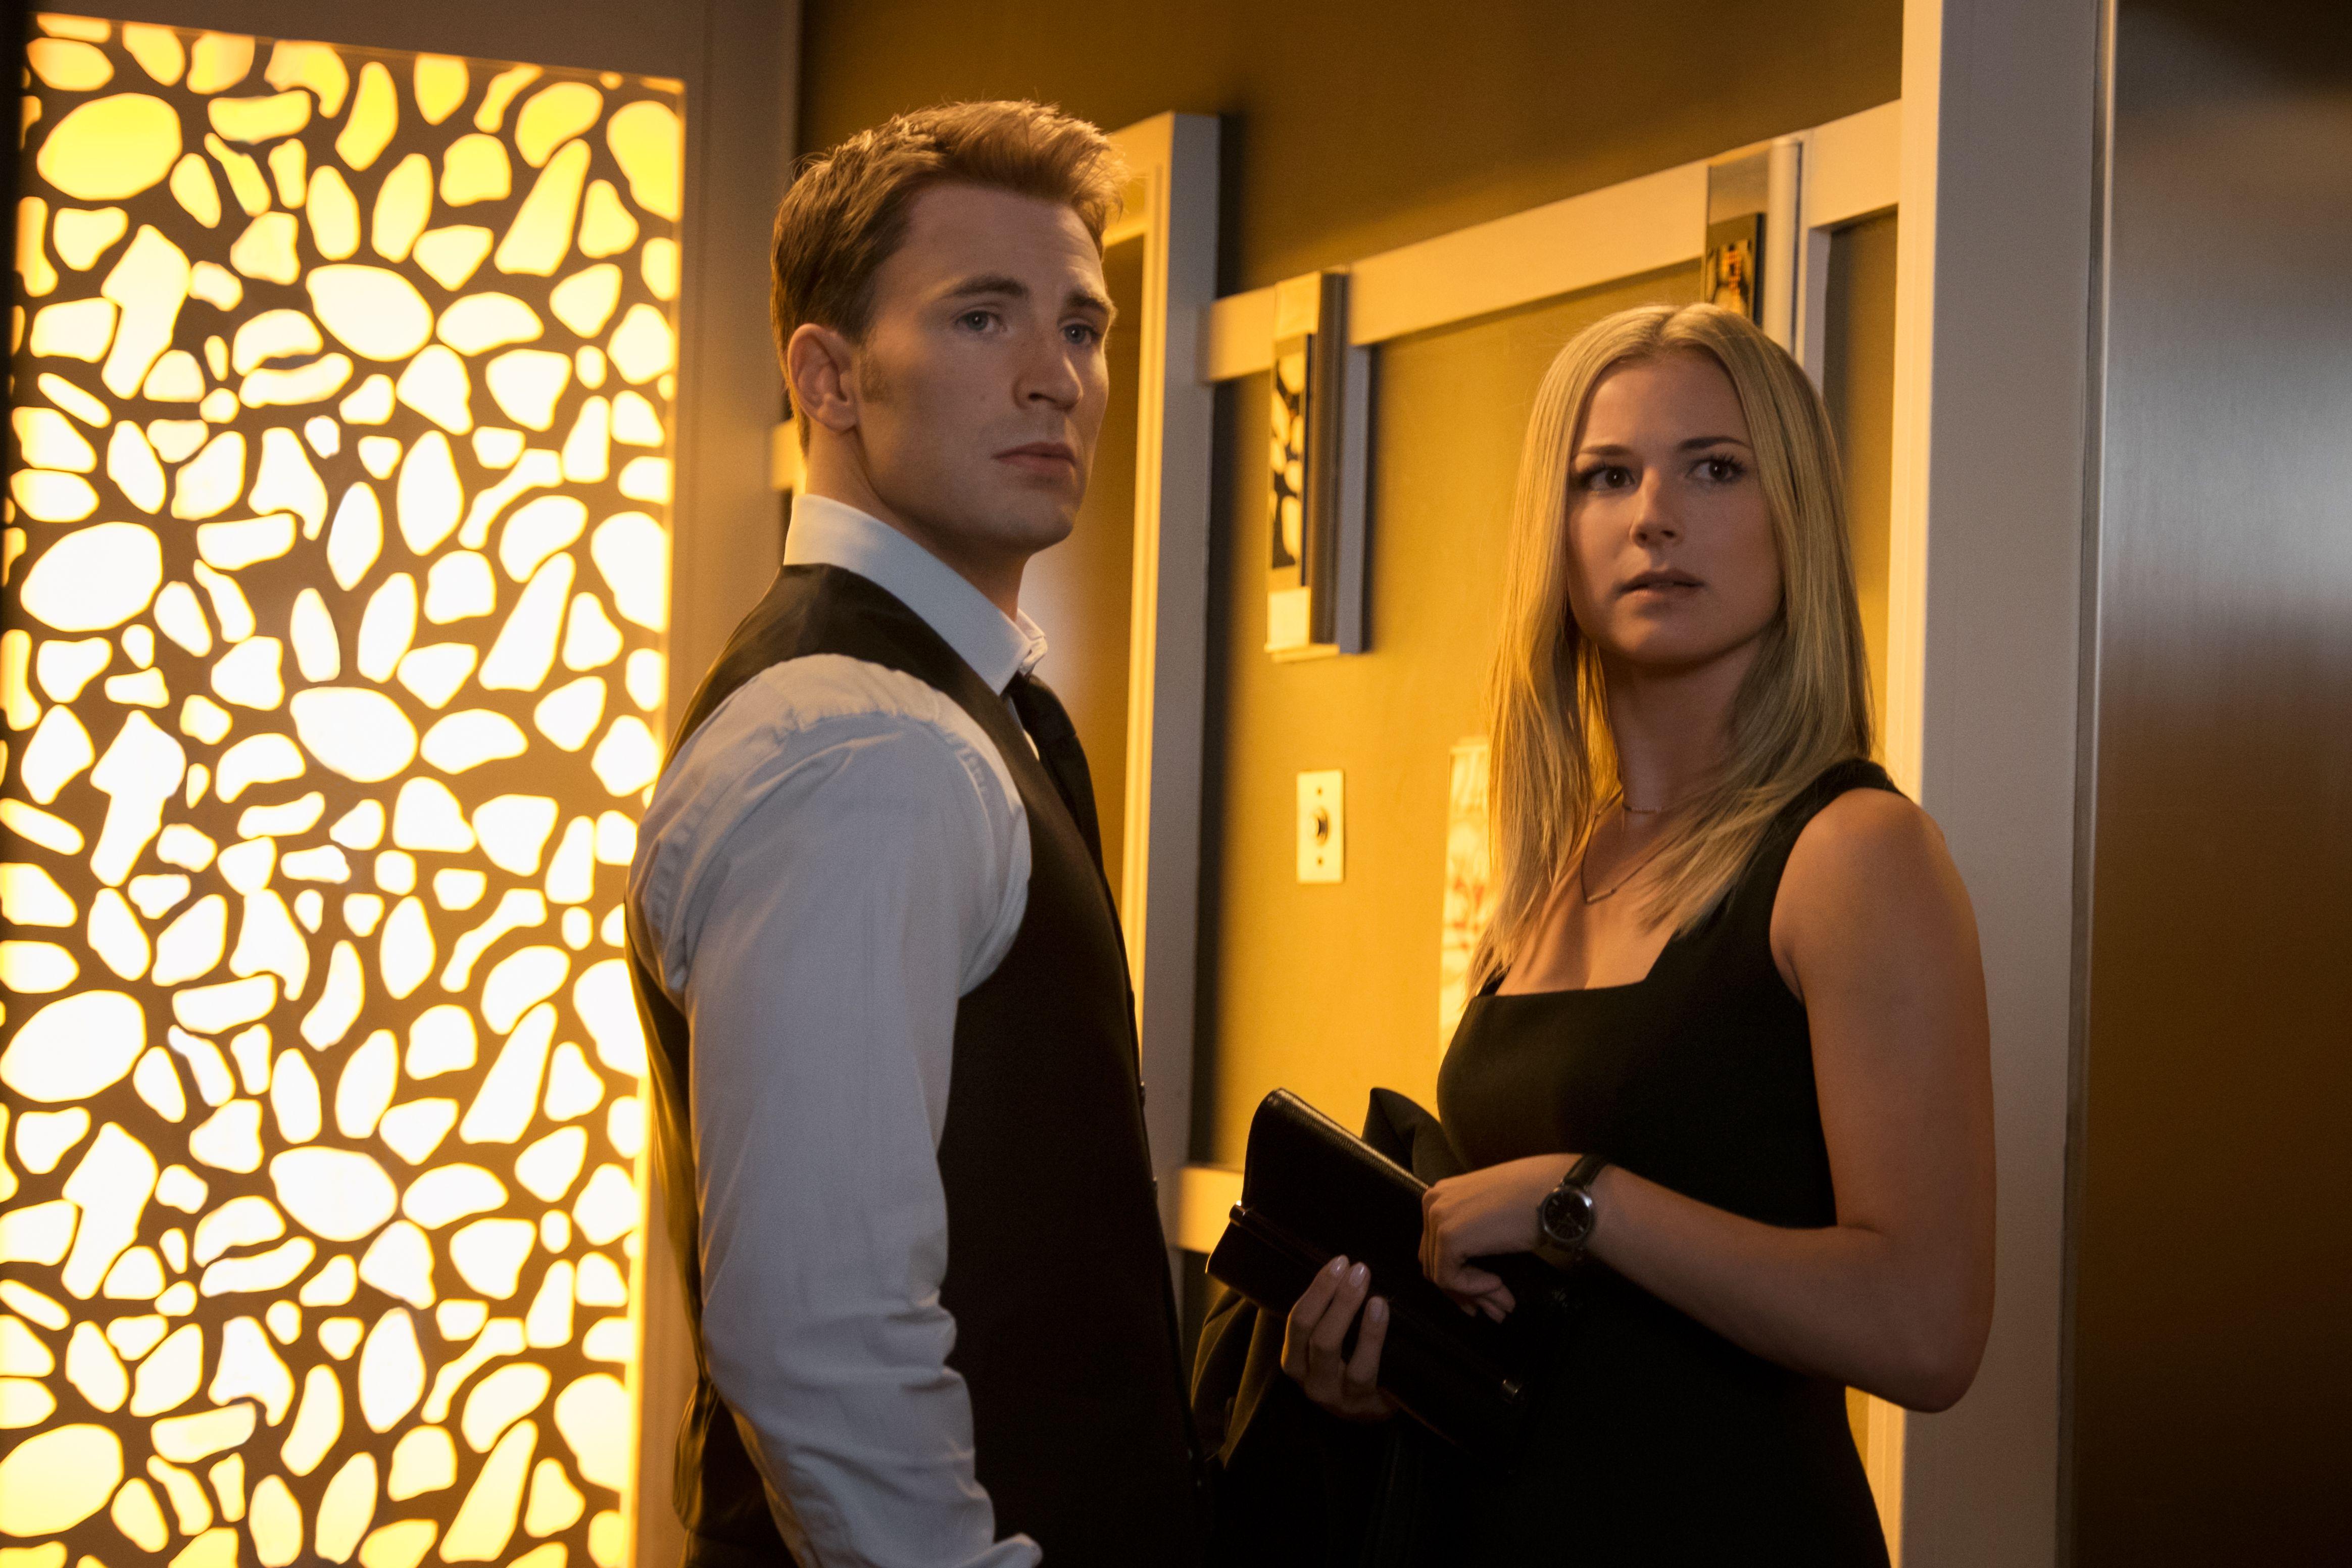 Emily VanCamp Admits Her 'Captain America' Kiss Scene Might've Gone Too Far